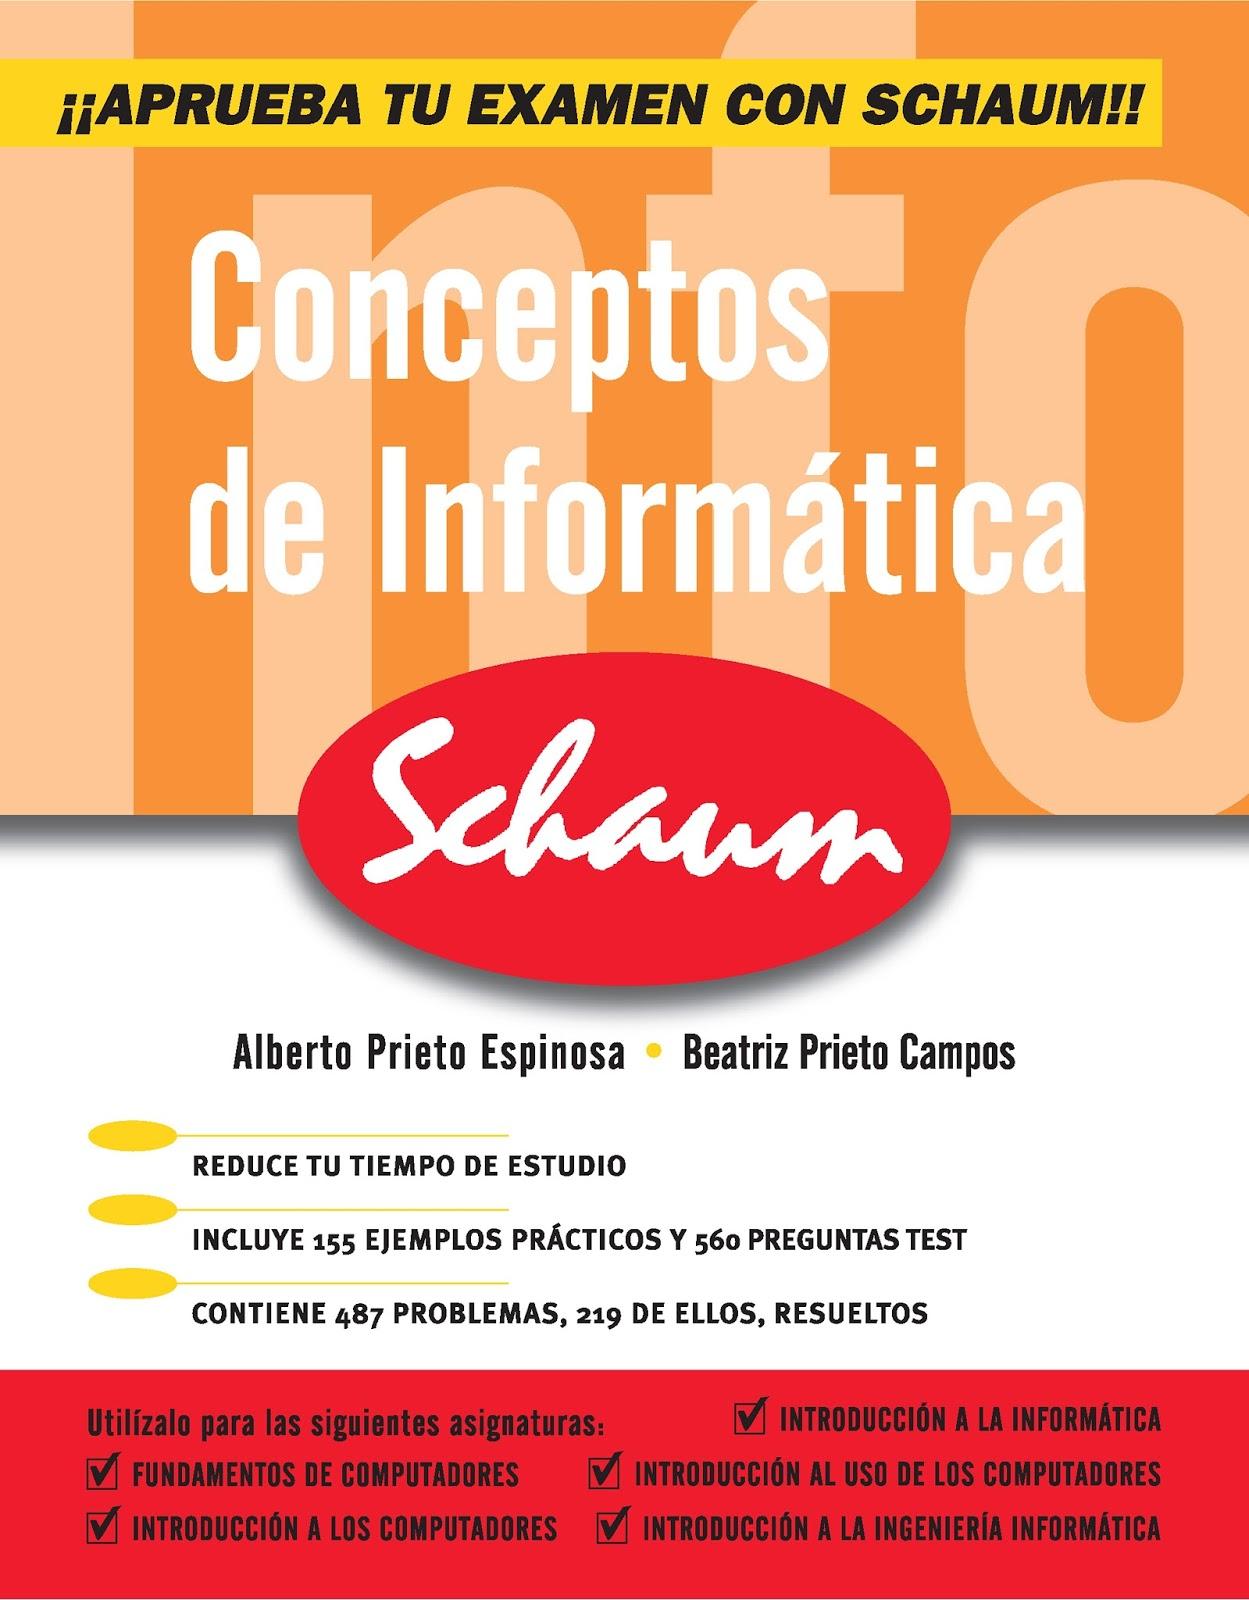 Conceptos de informática – Alberto Prieto Espinosa